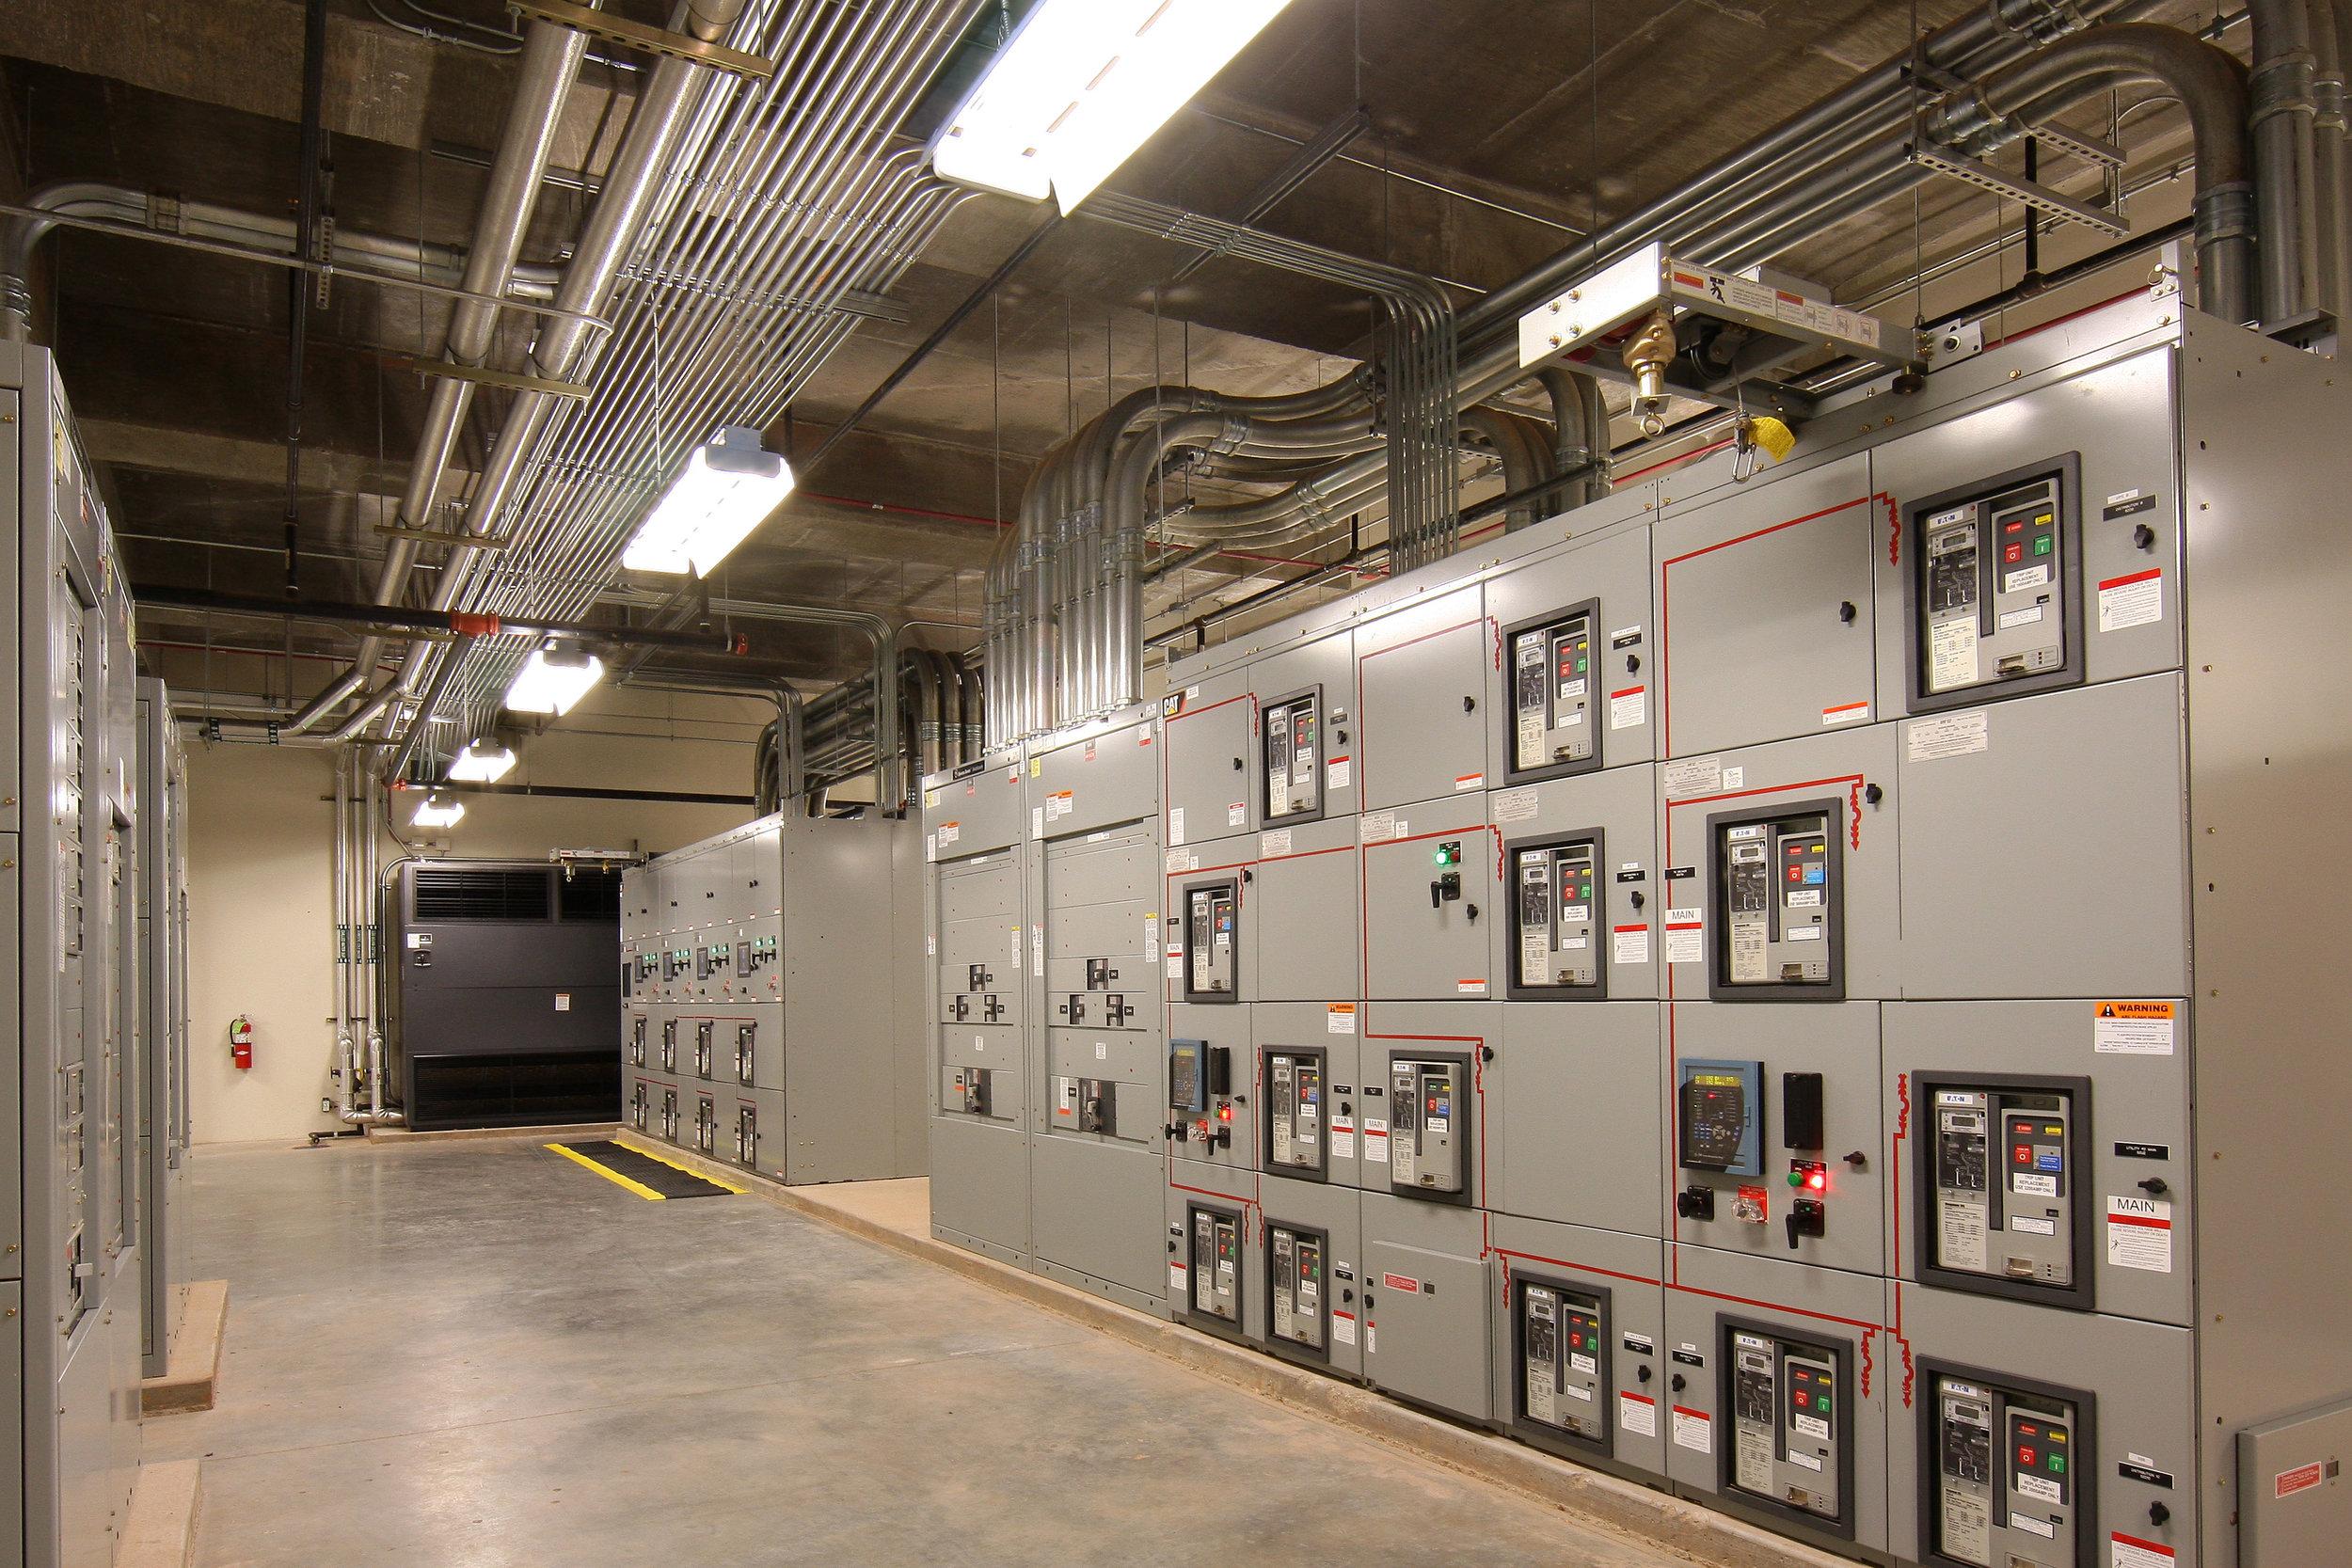 OSF_electricalroom_01.jpg